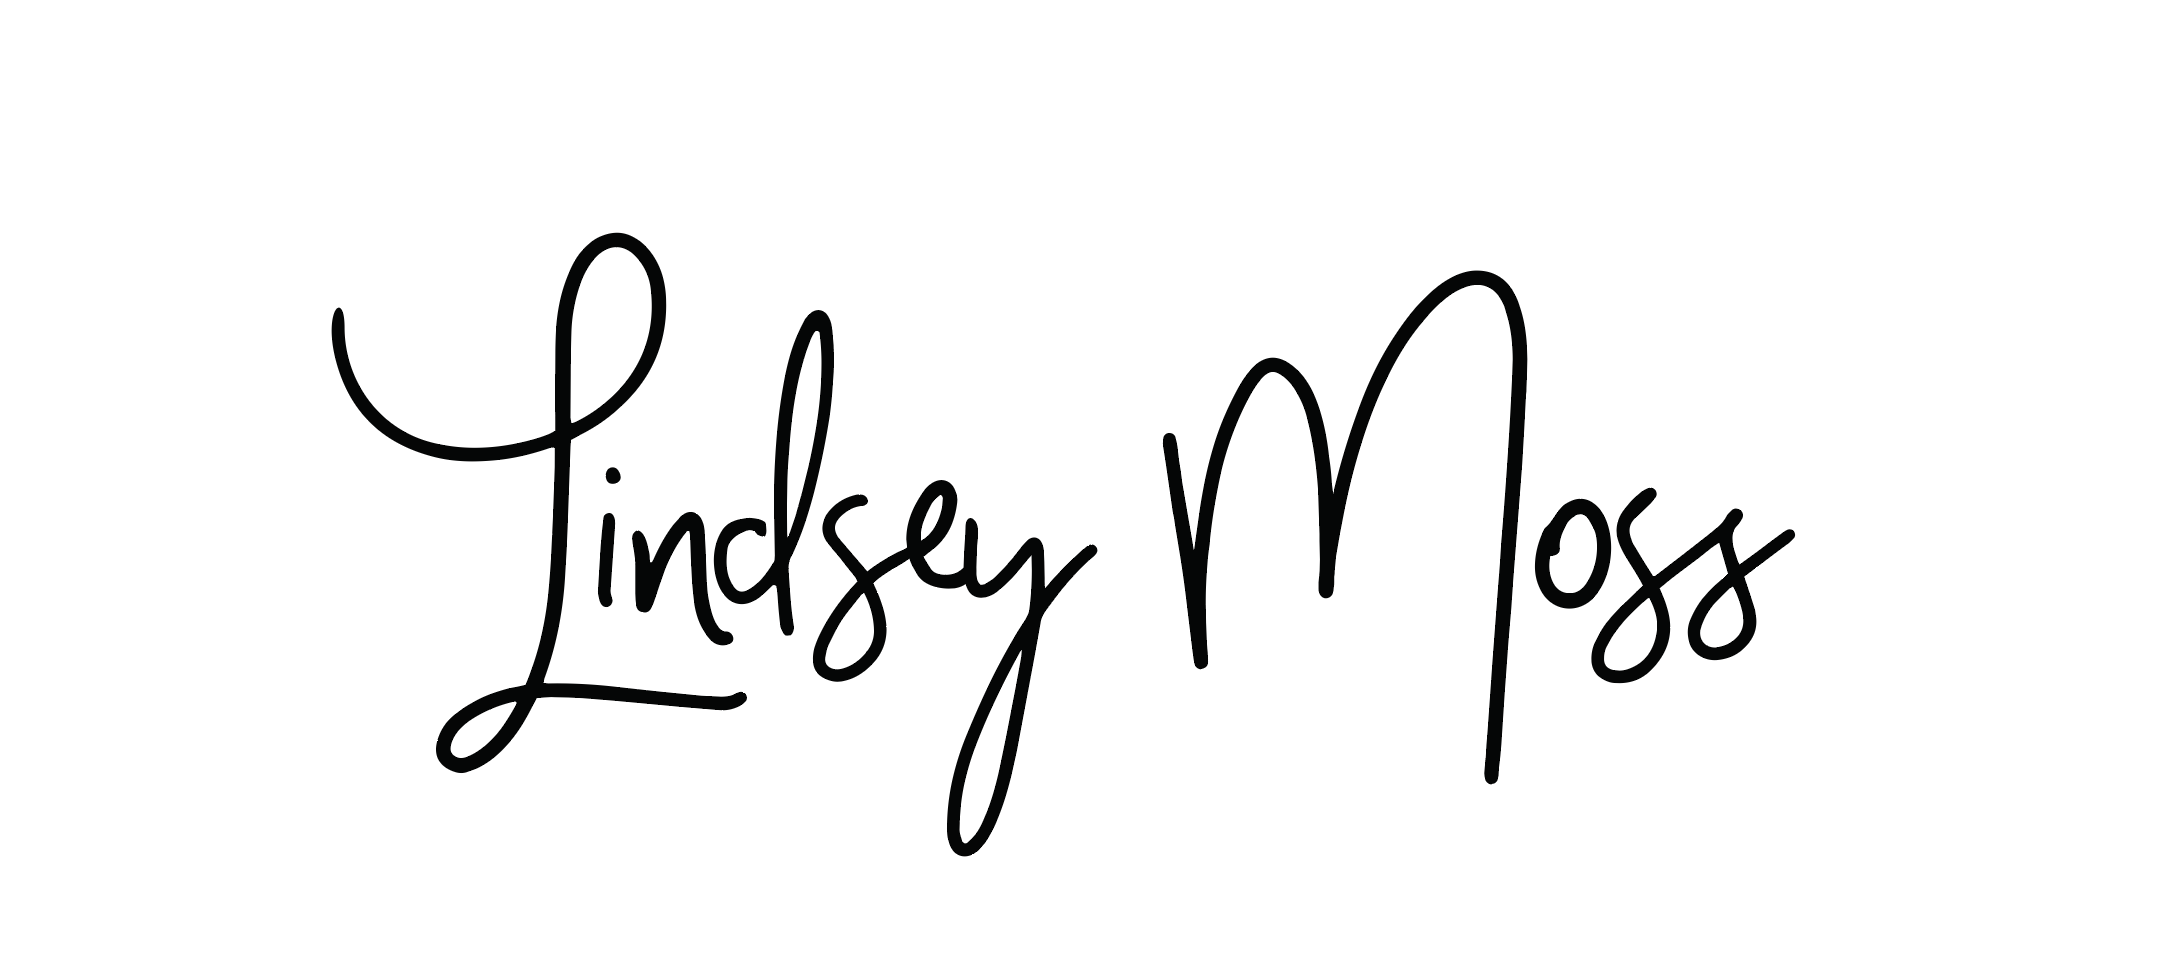 Lindsey Moss